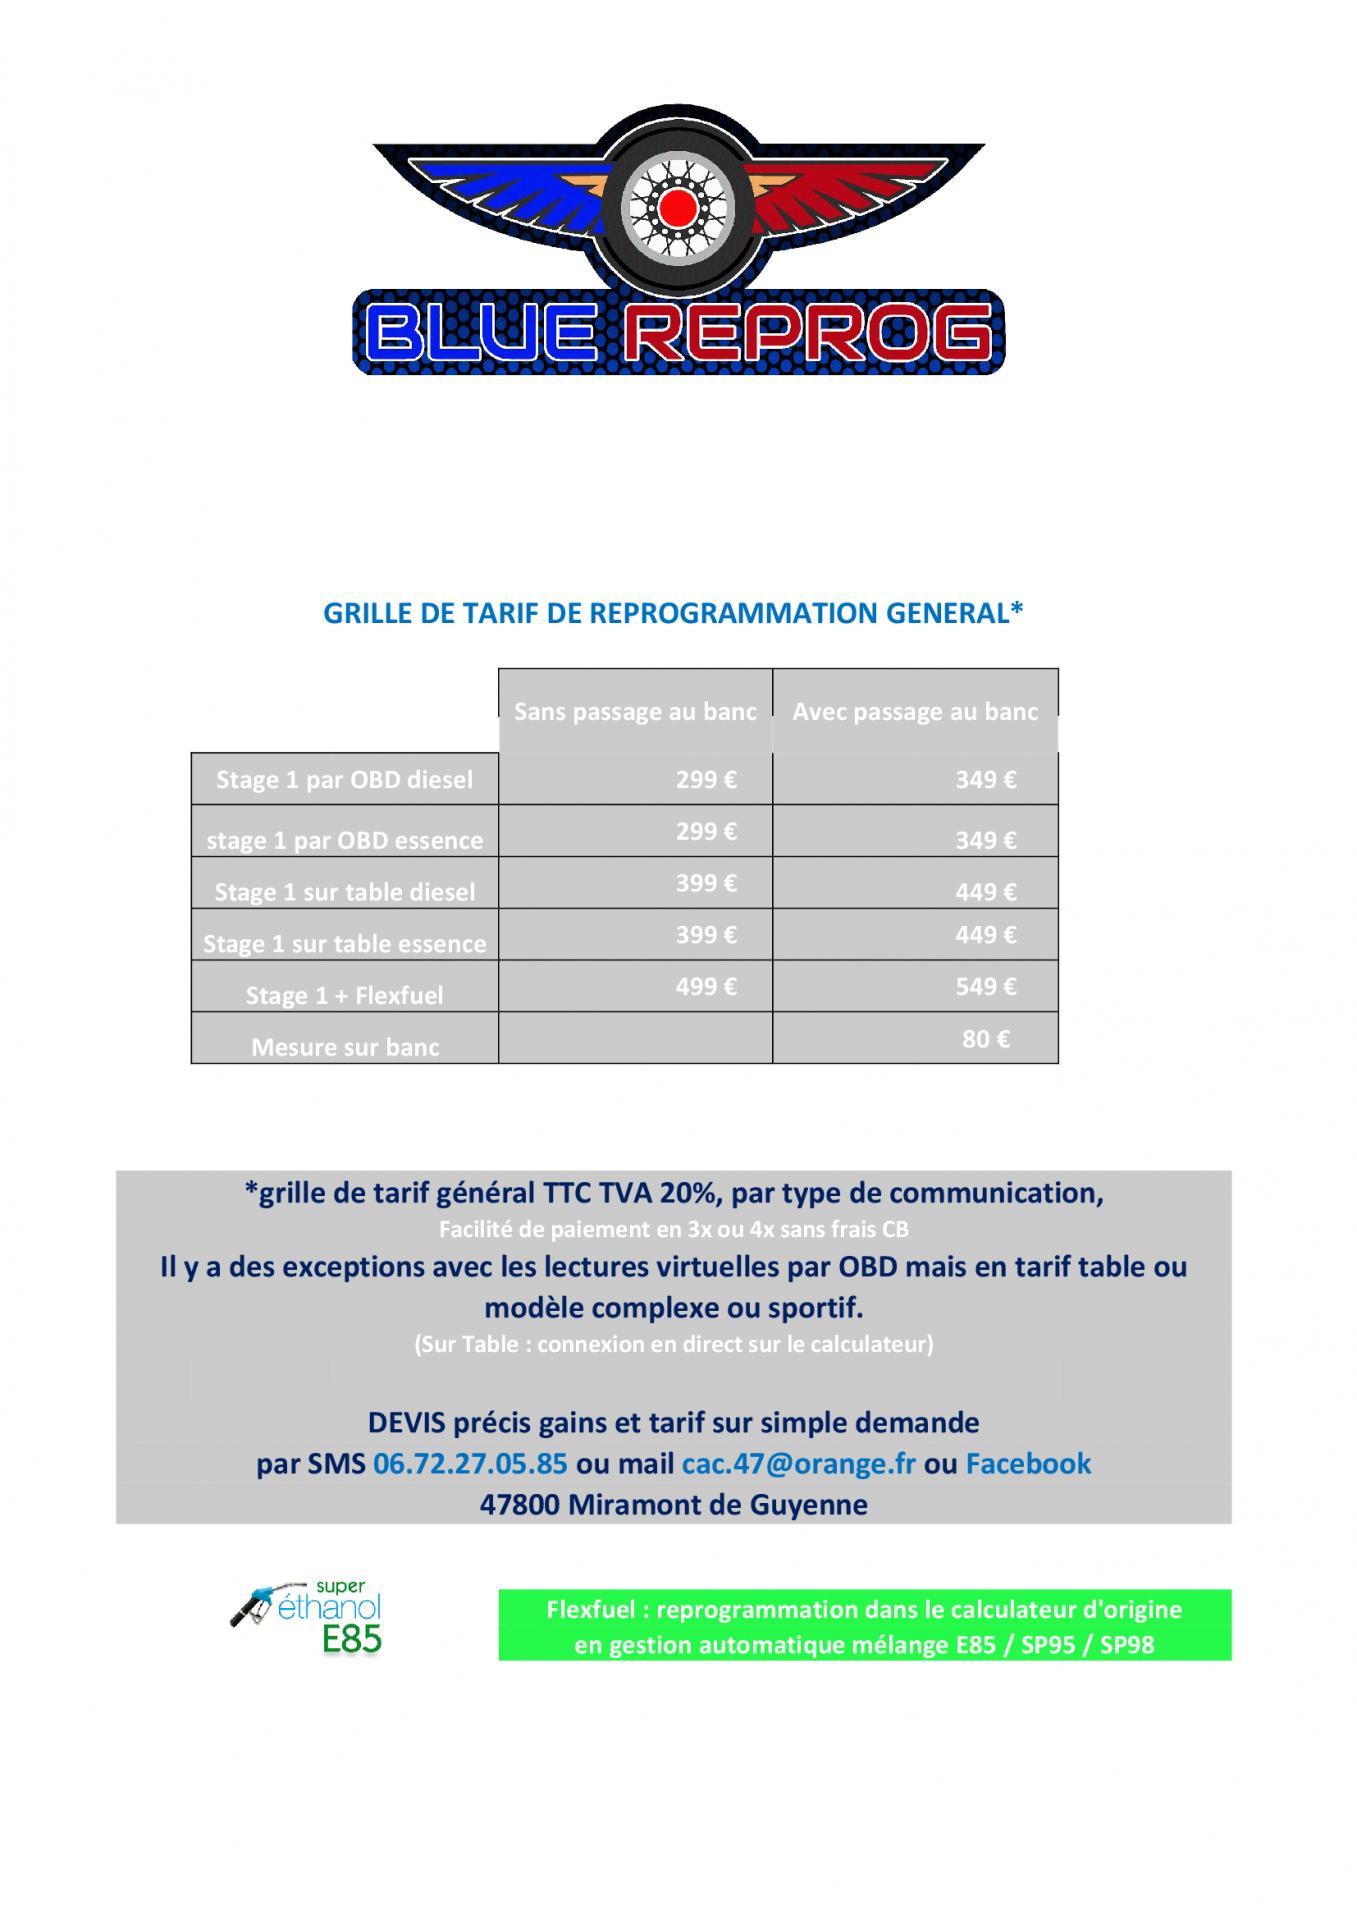 Grille de tarif de reprogrammation general